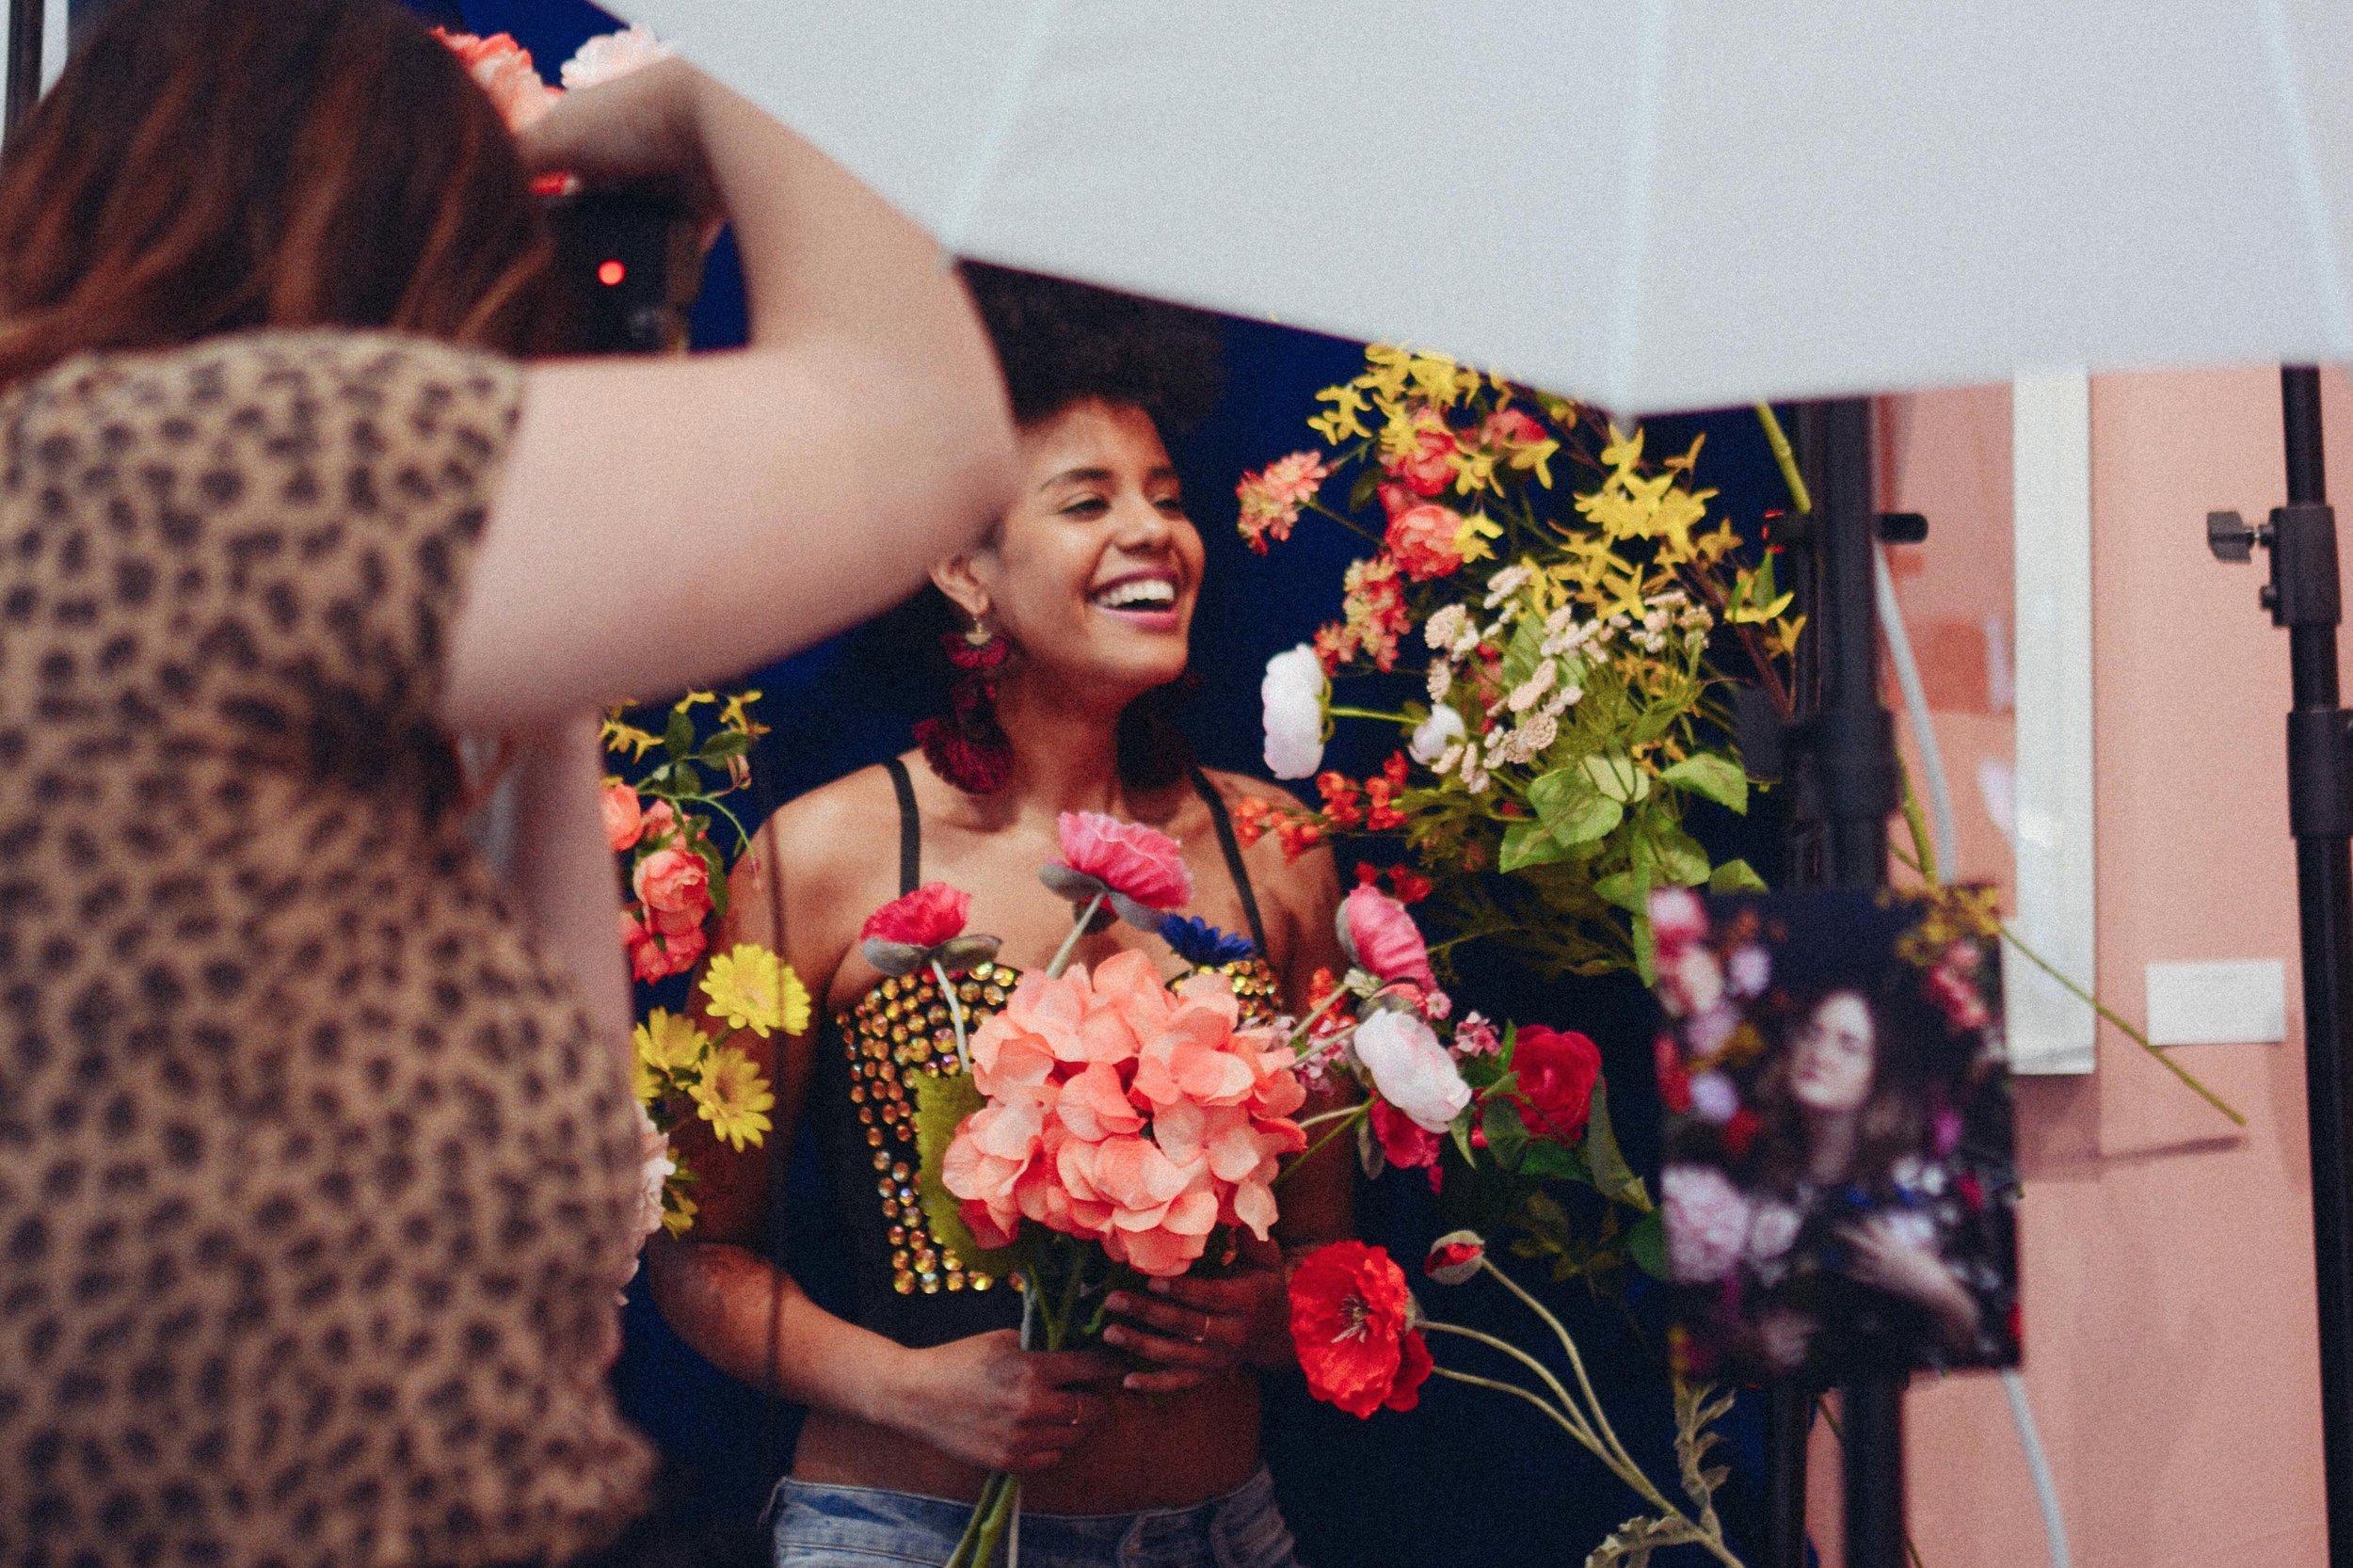 Primavera Portraits - Ren Adkins, Marrow Creative, Rasharie Brown, Ariana Anhaltphotos coming soon